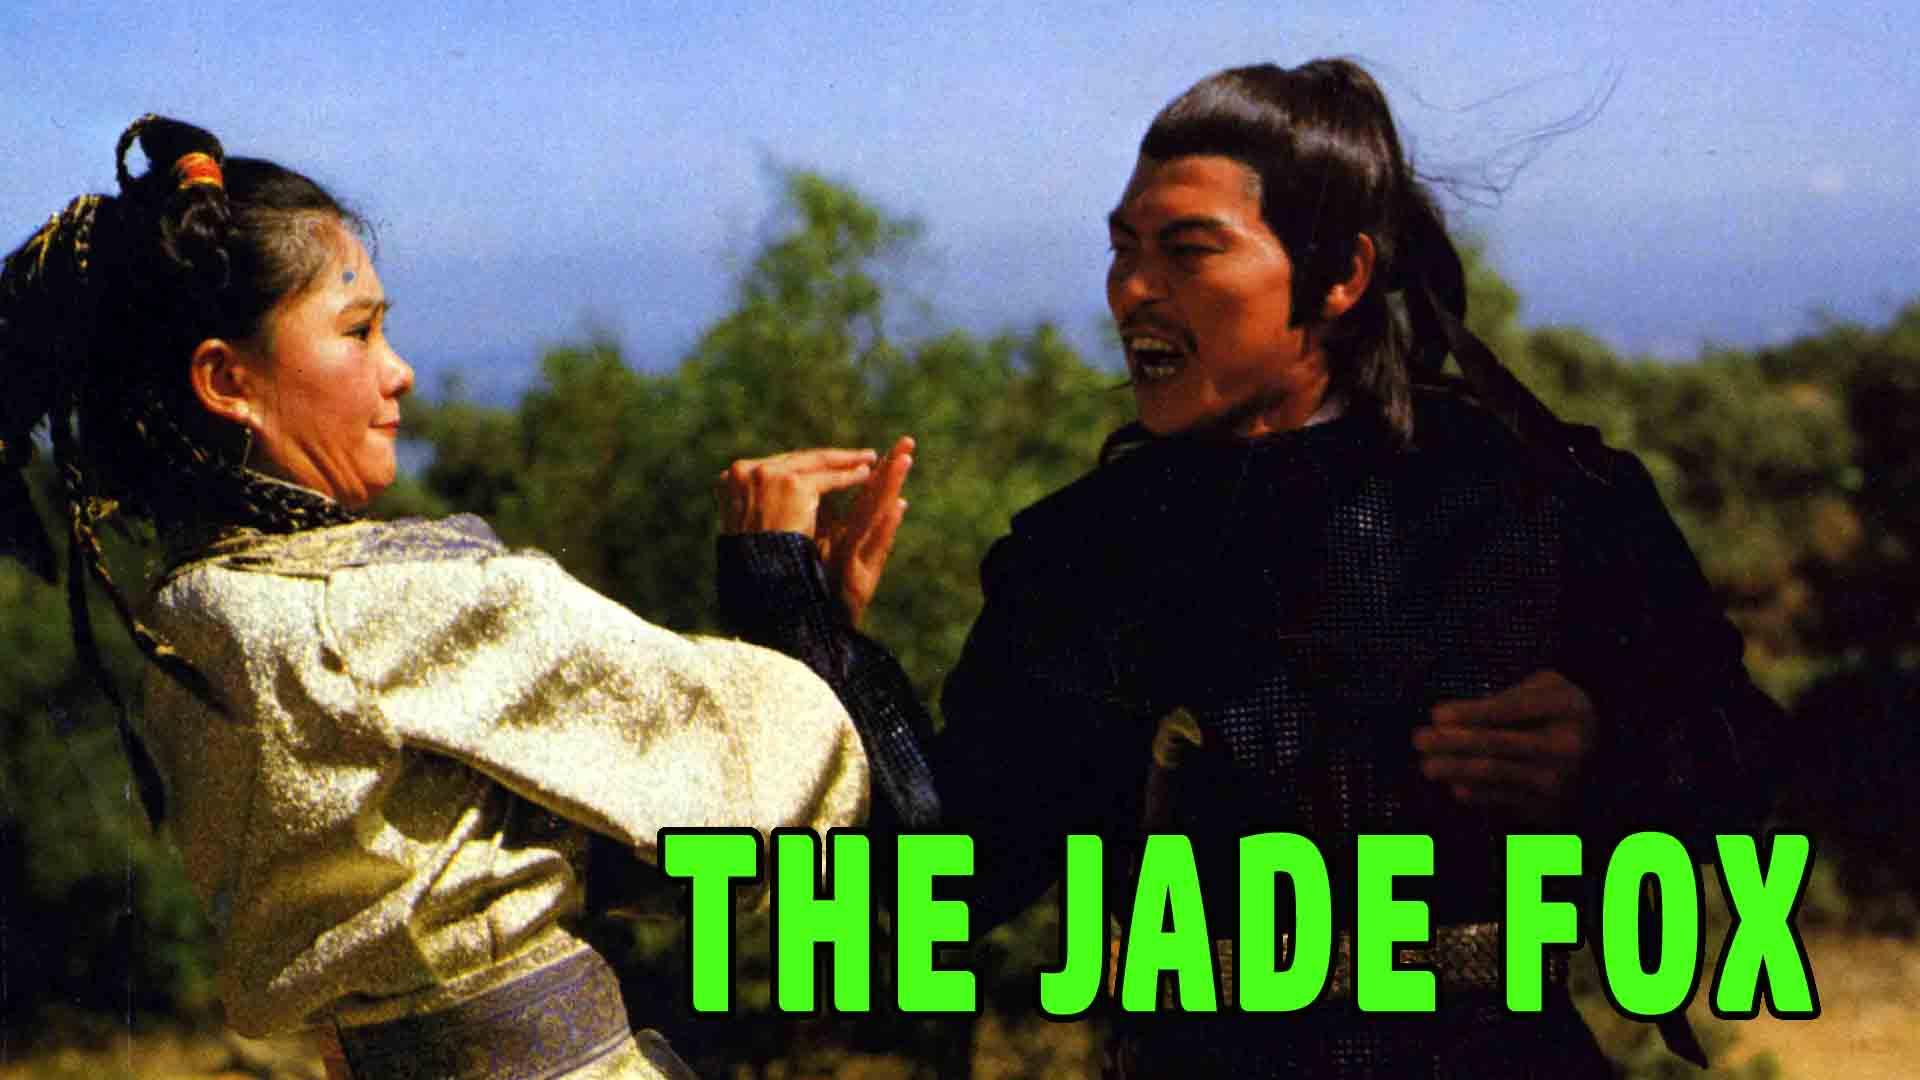 The Jade Fox